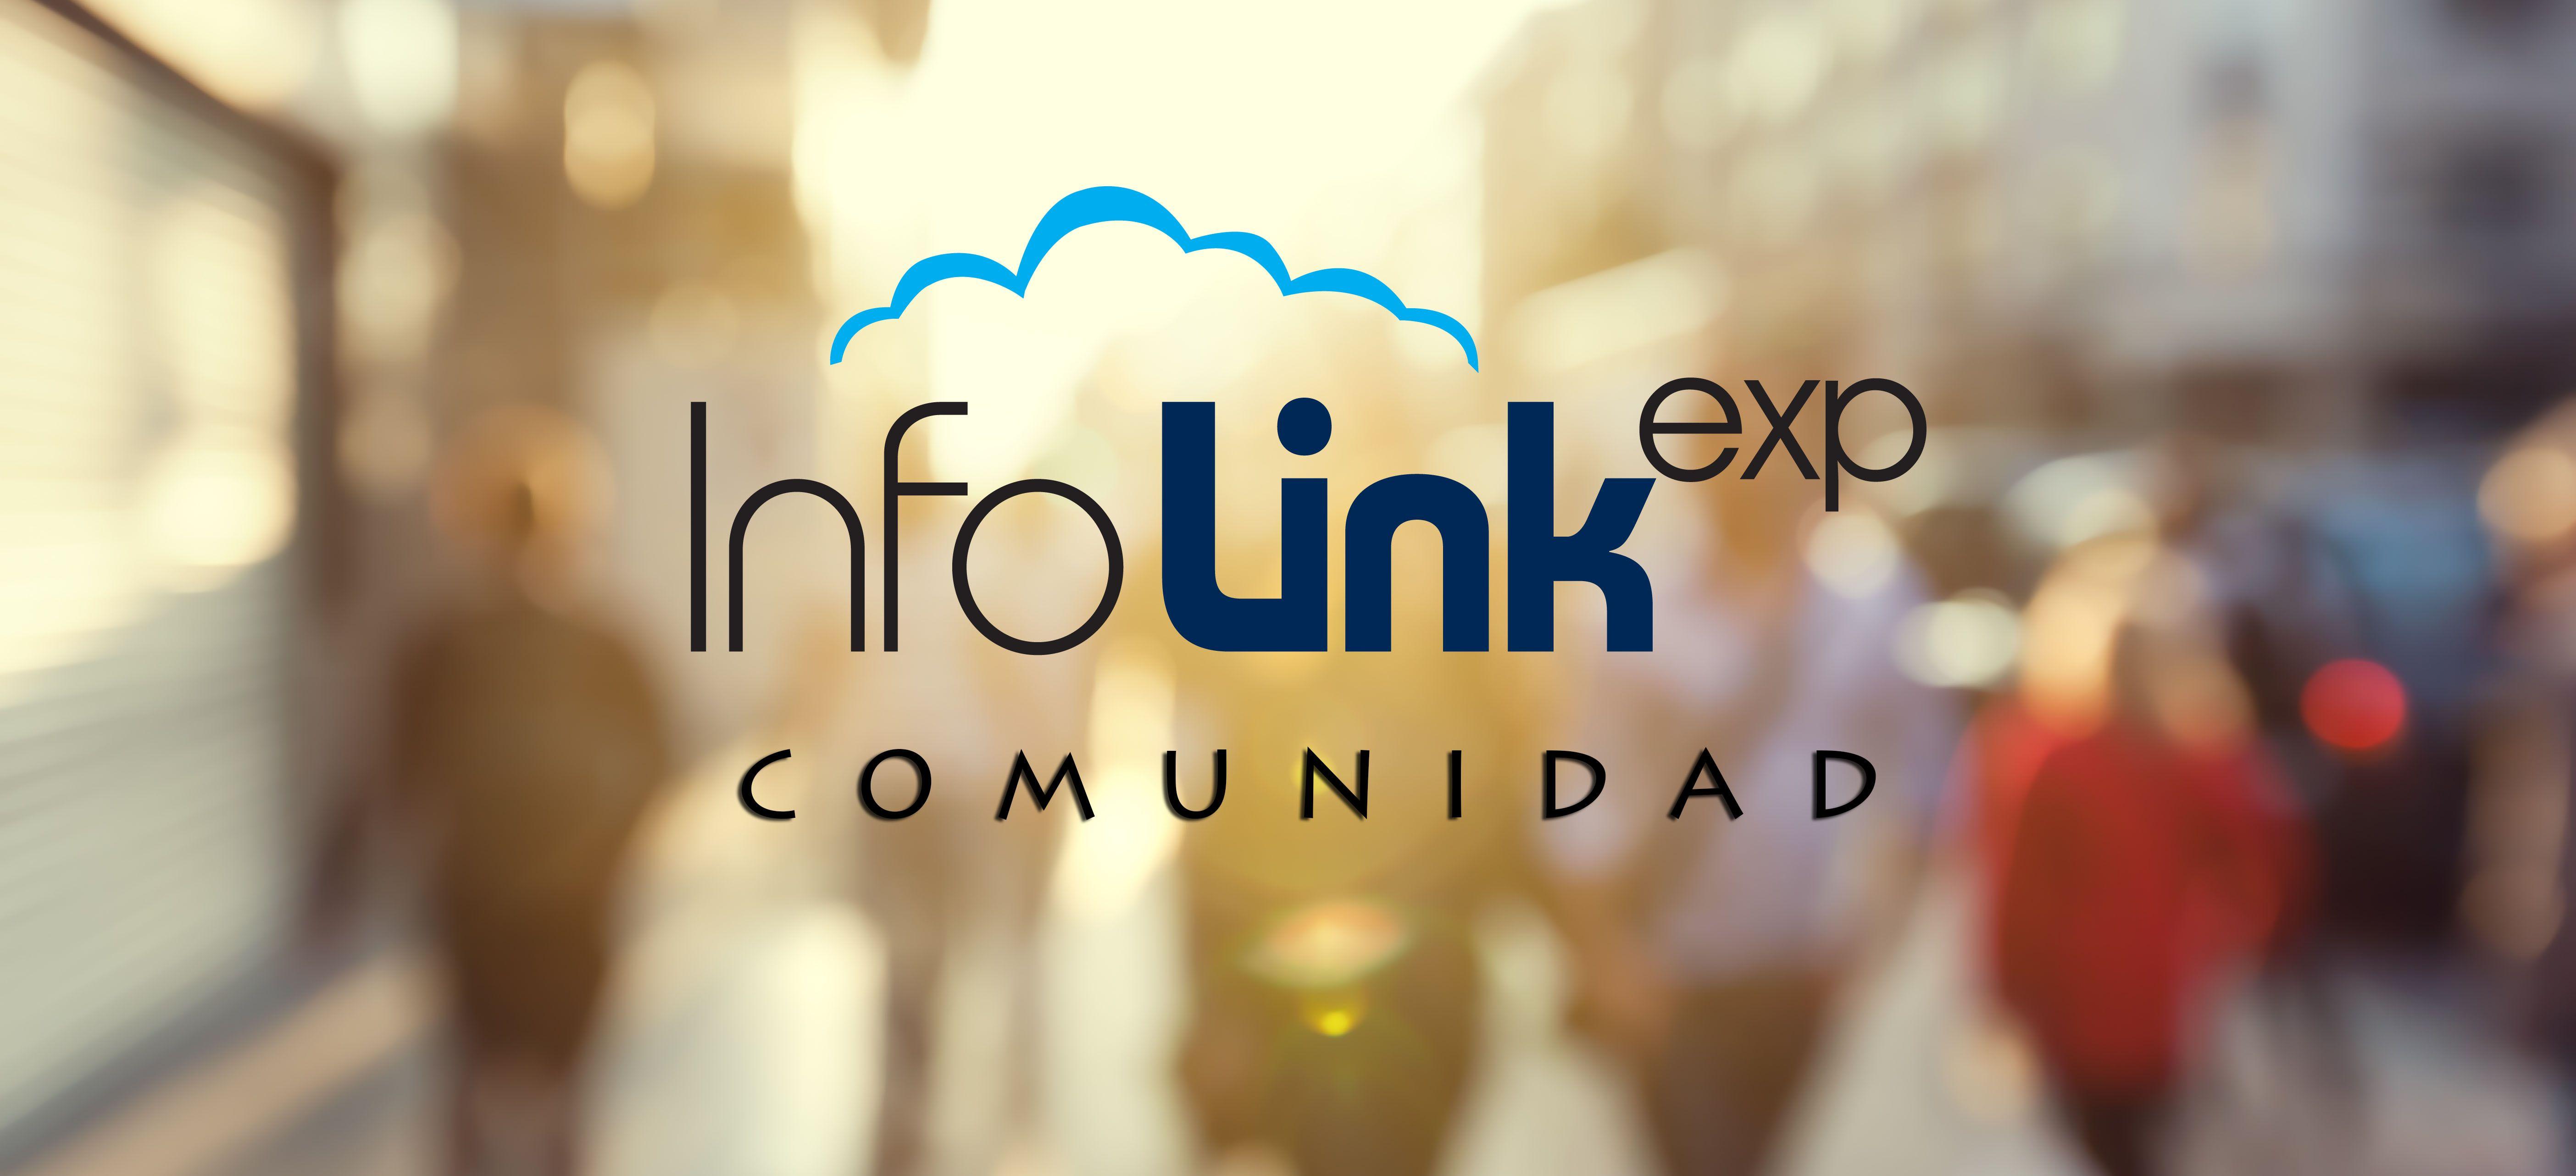 Infolink comunidad